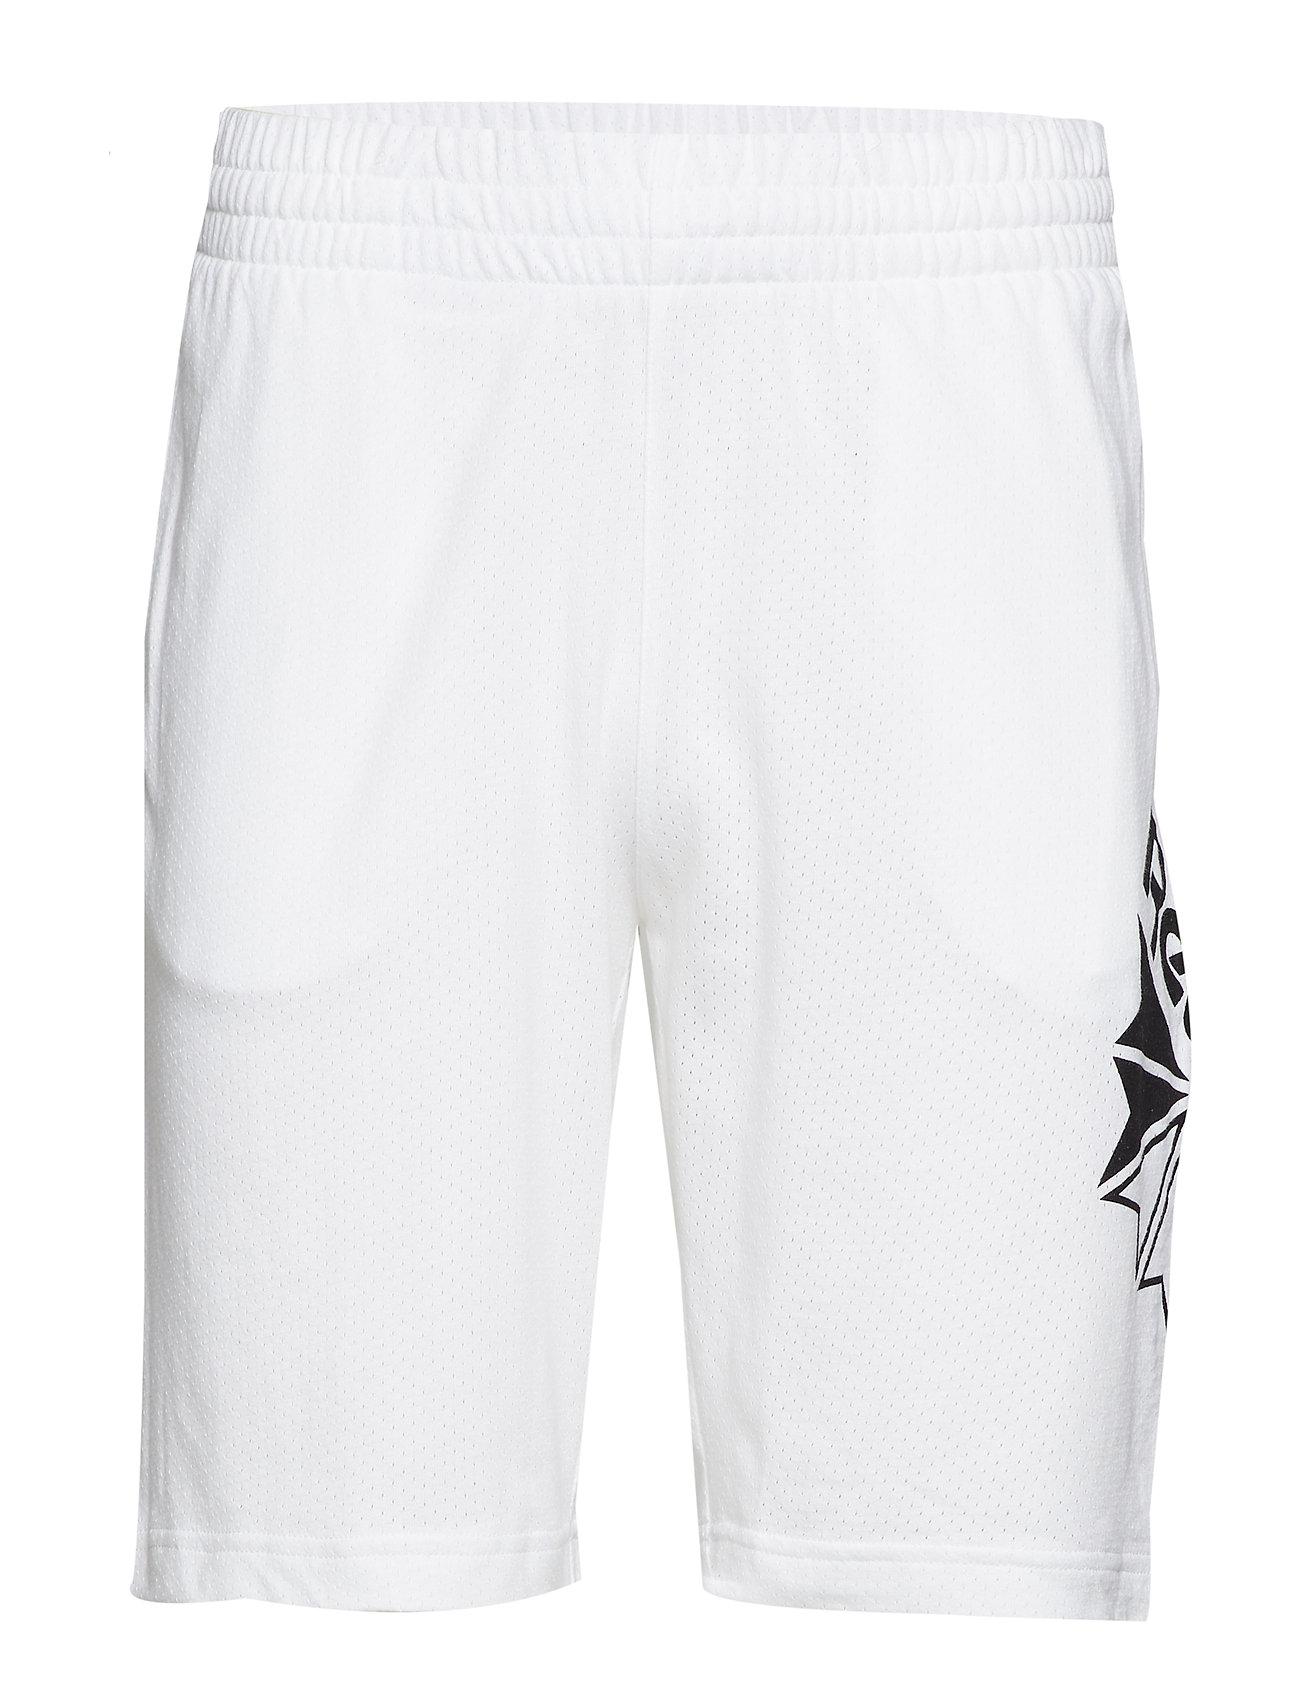 Reebok Classics CL GP  Short - WHITE